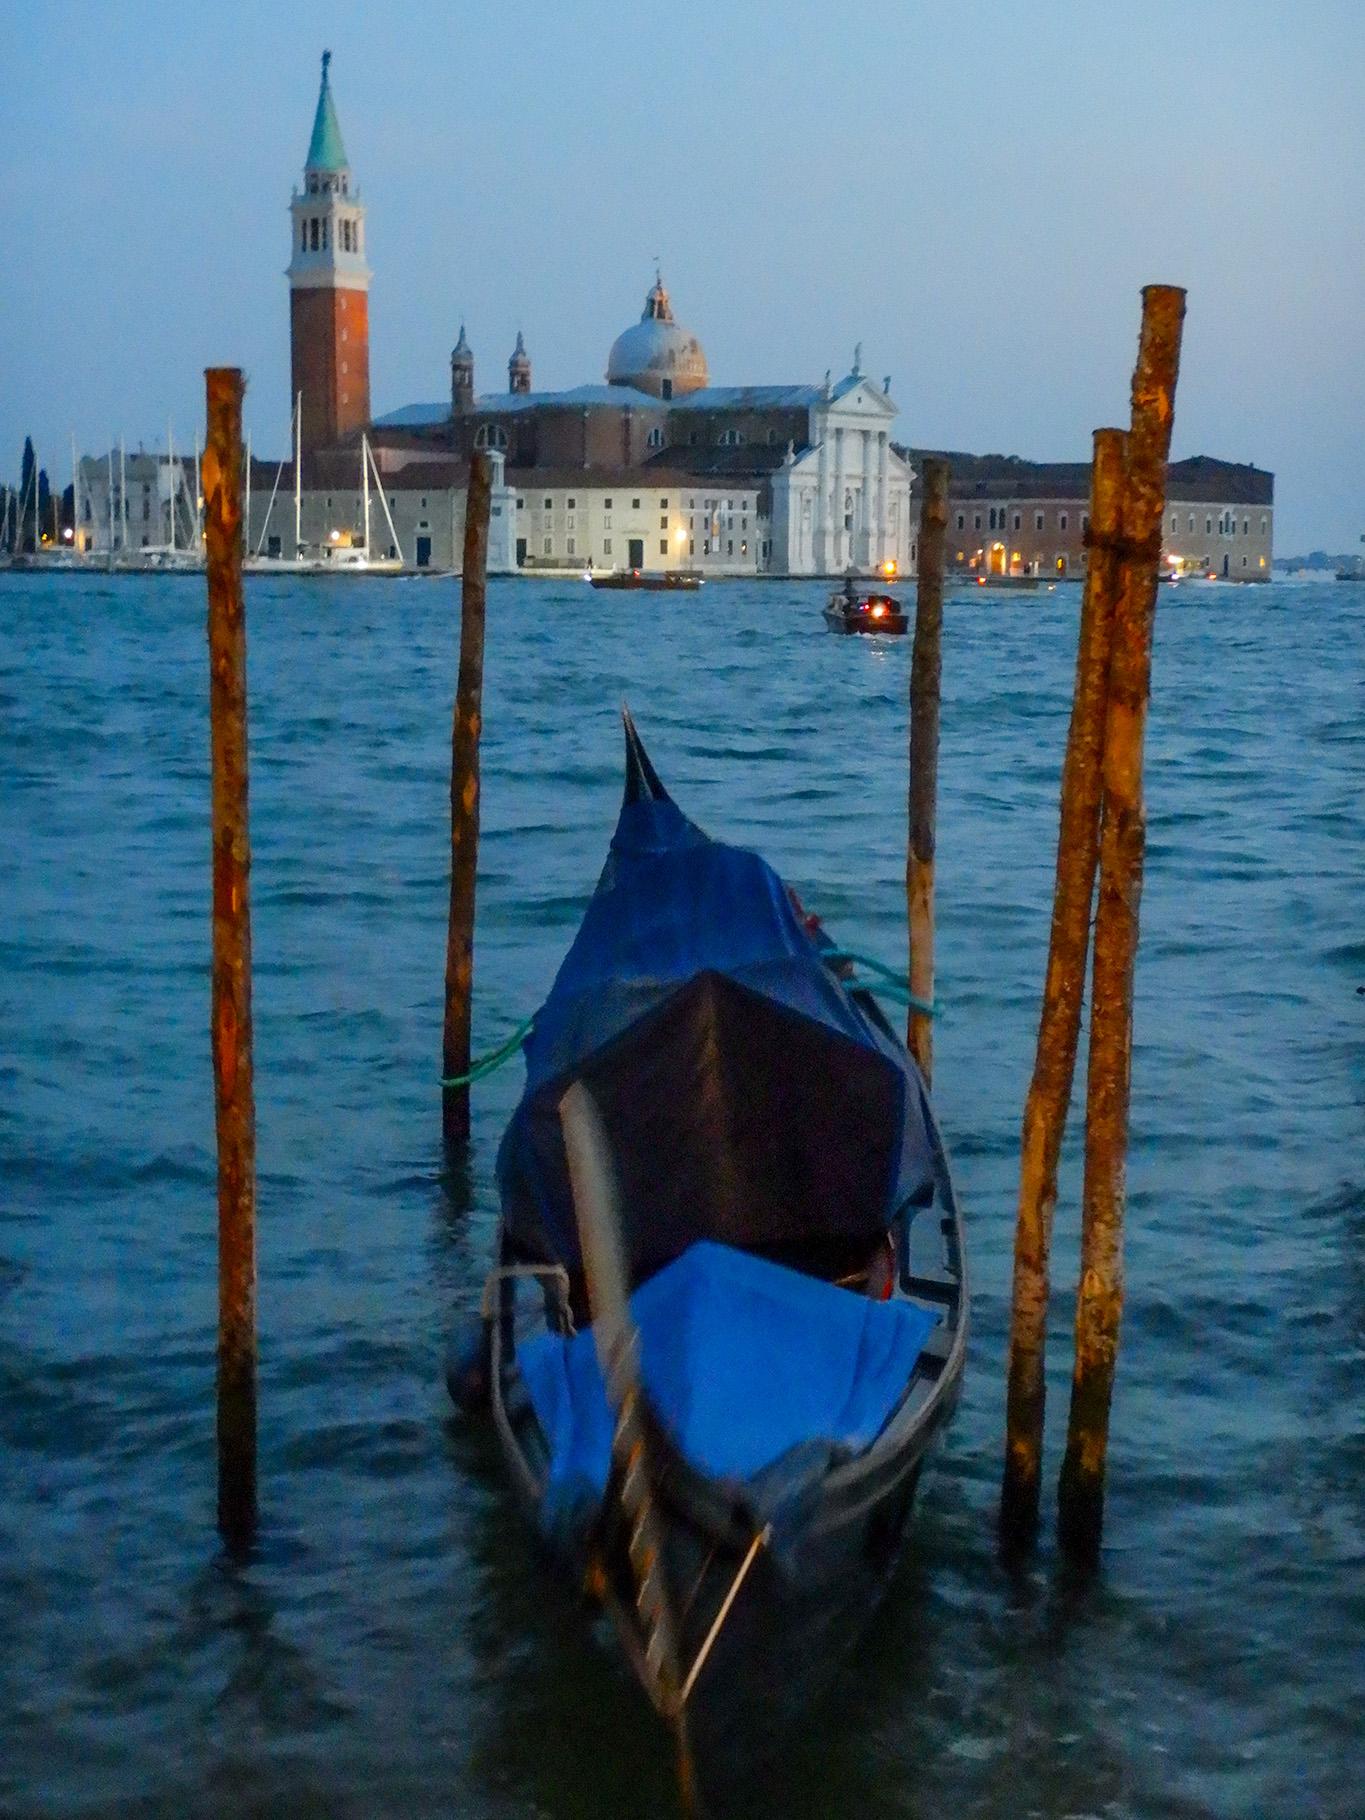 20171002 - Venice - 548.jpg